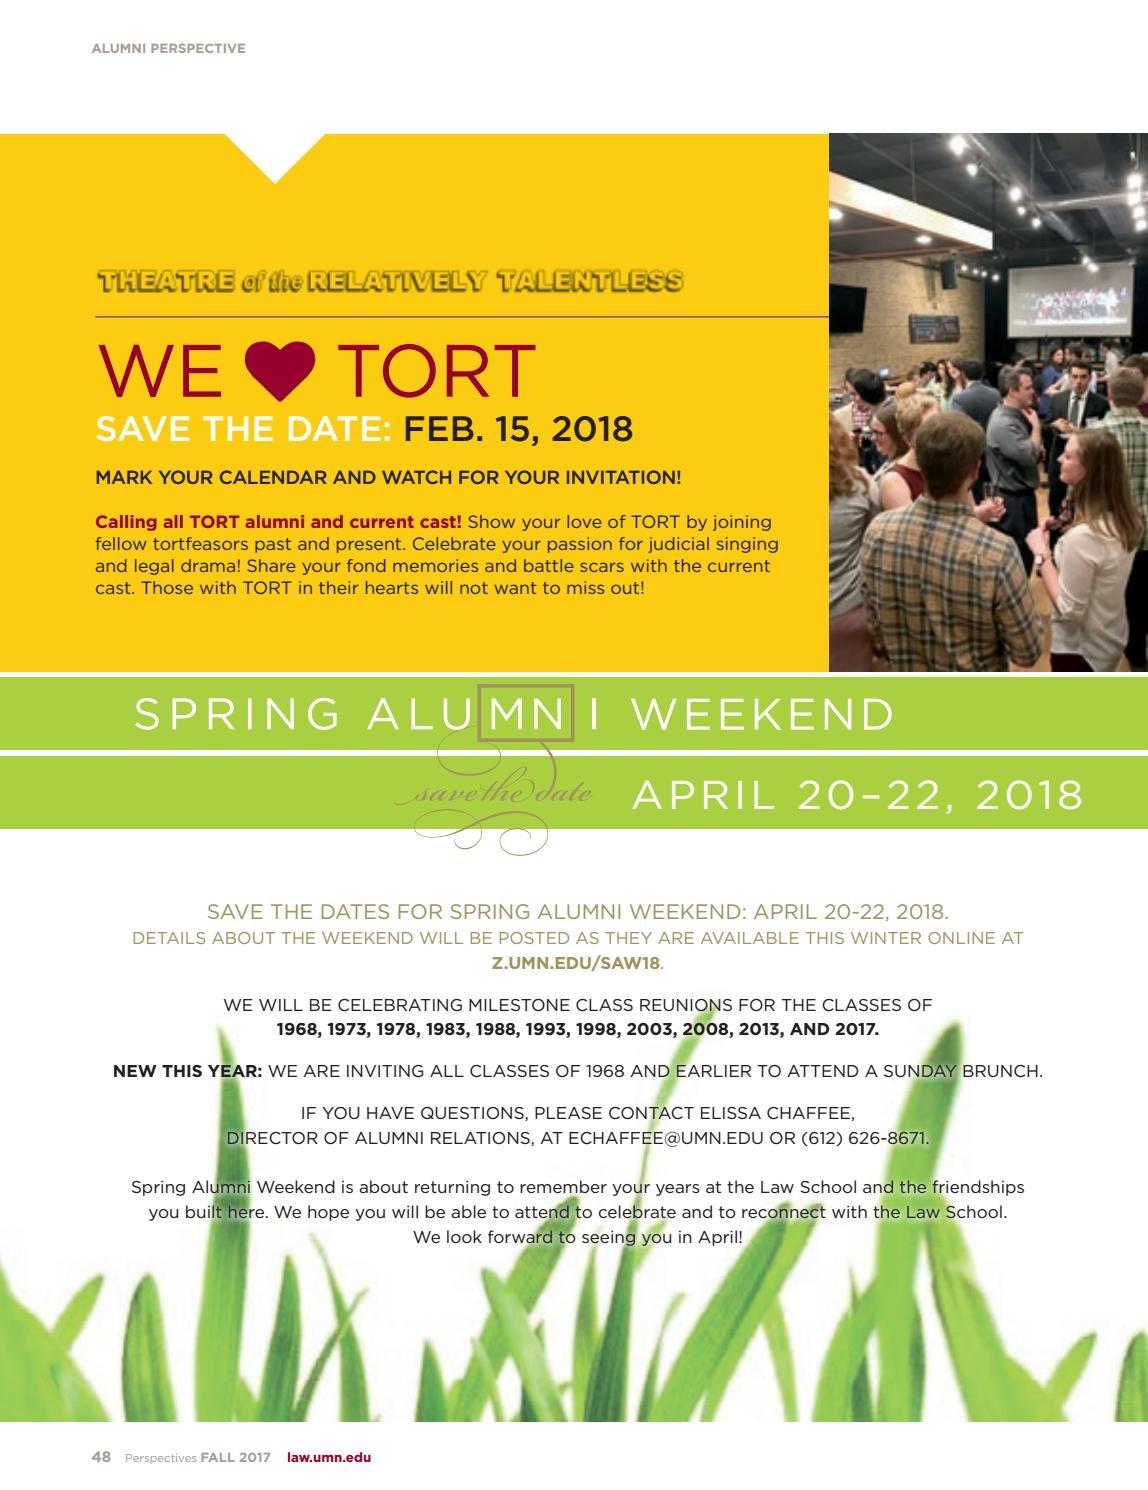 Fall 2017 Perspectivesuniversity Of Minnesota Law School – Issuu Calendar 2019 Umn